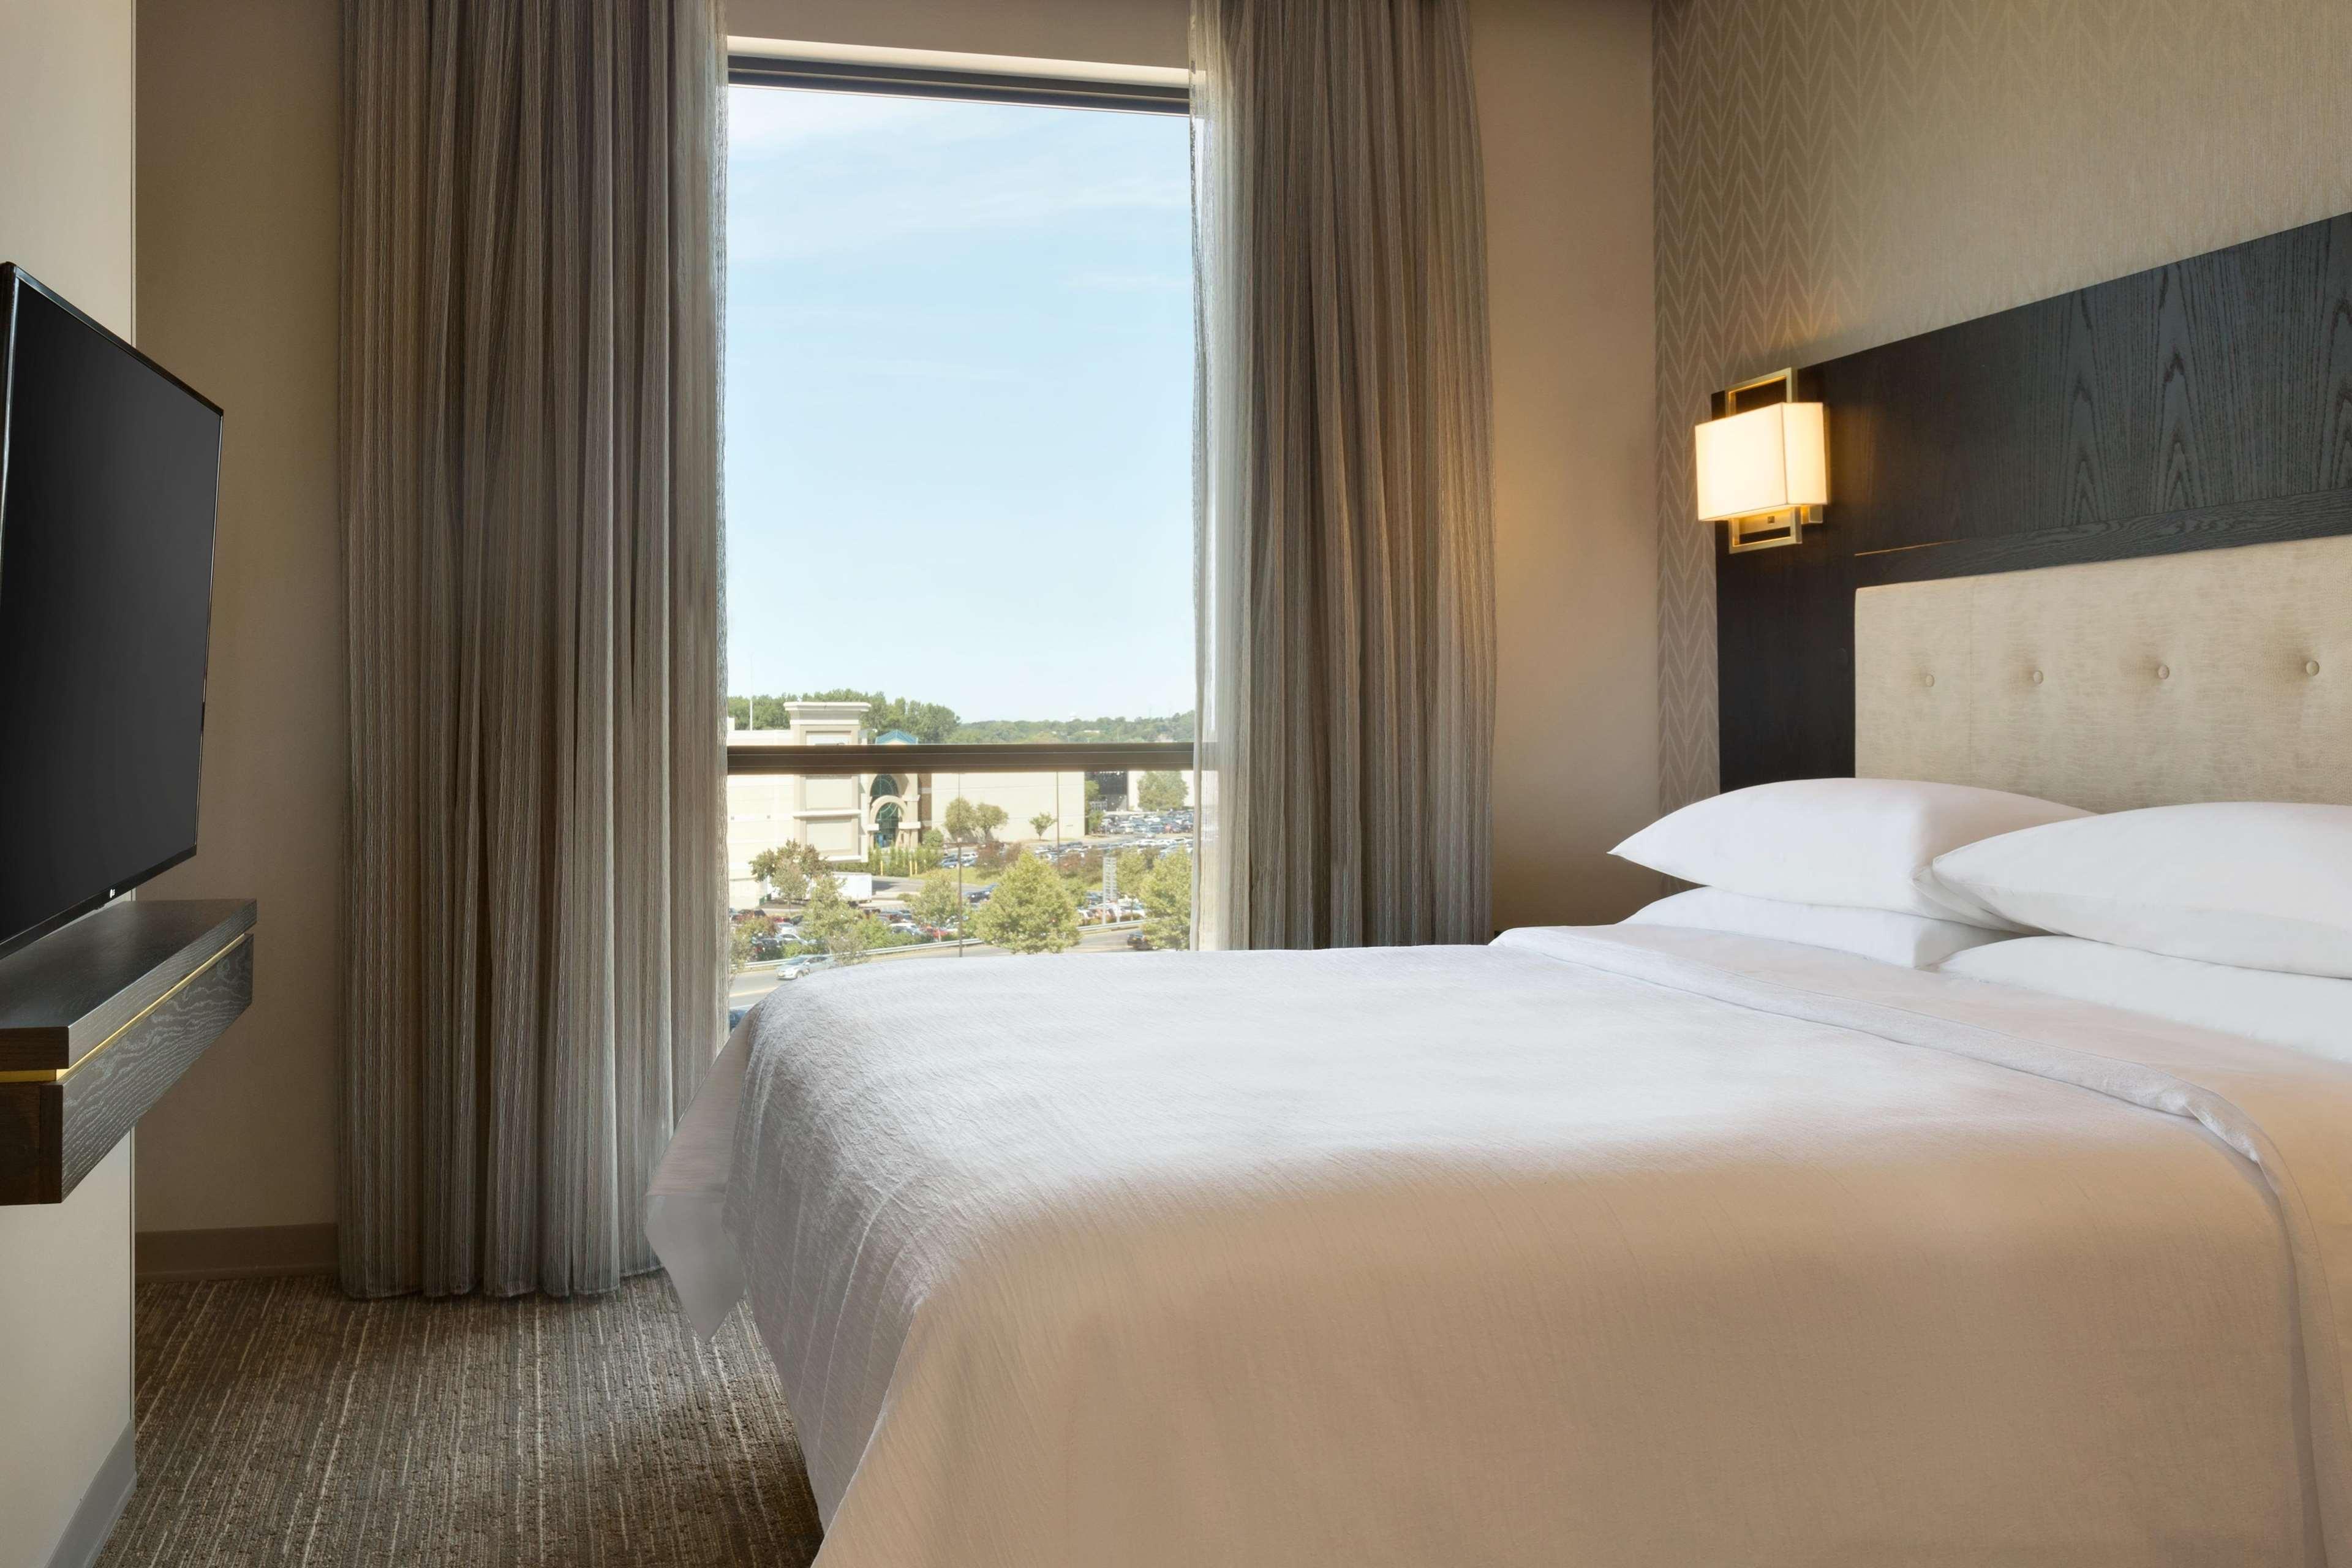 Embassy Suites by Hilton Syracuse Destiny USA image 0